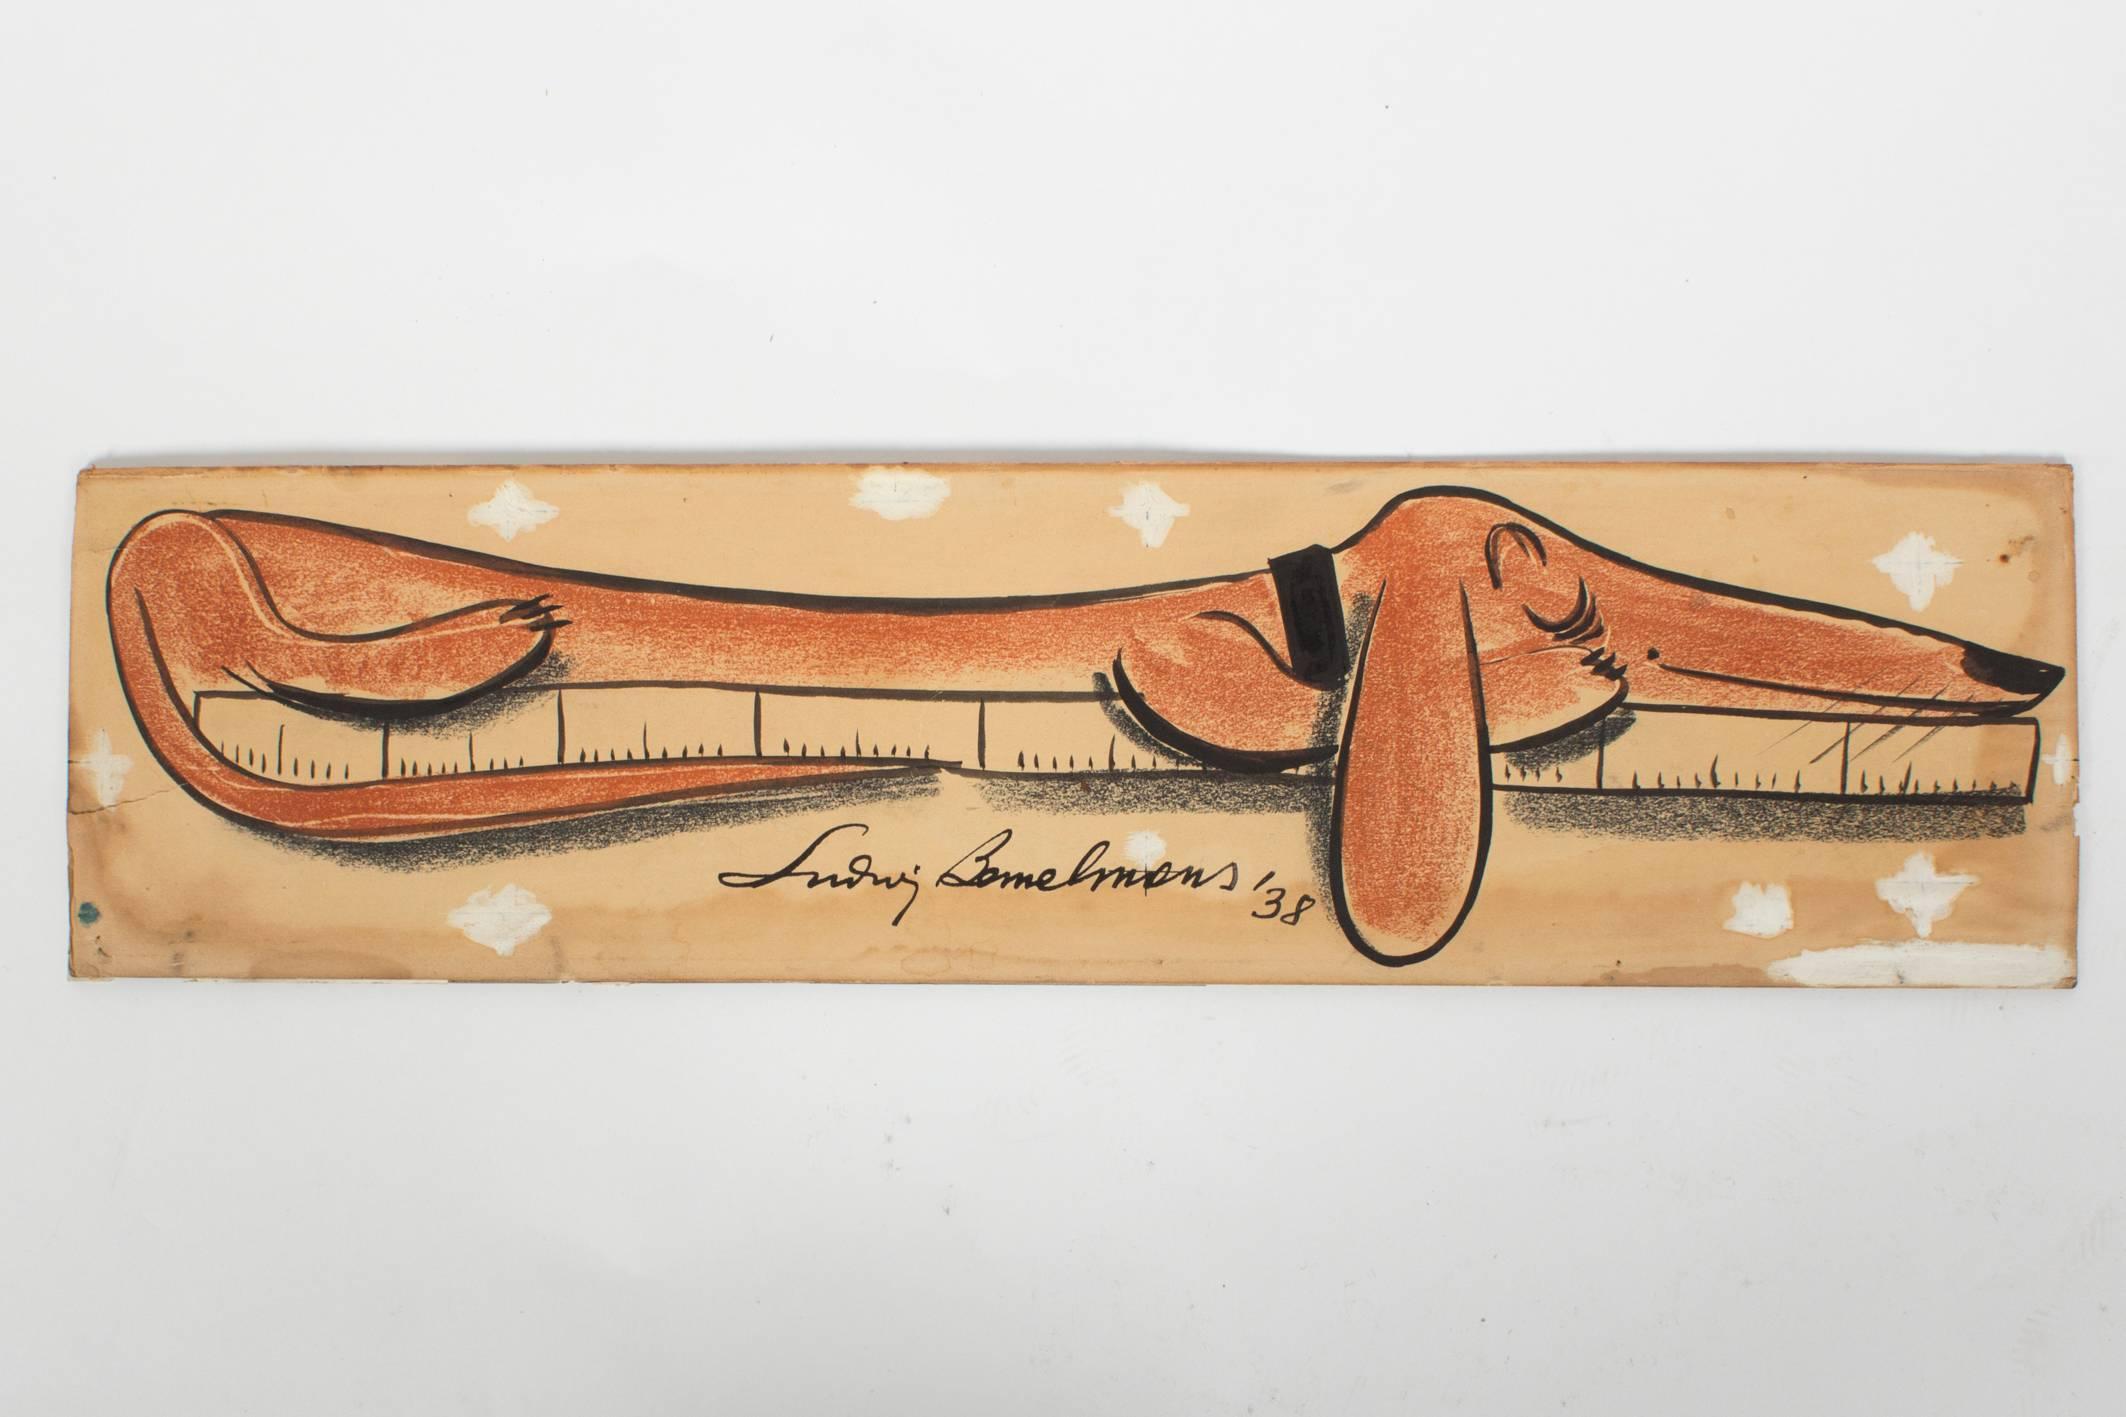 2126x1417 Ludwig Bemelmans, 1898 1962